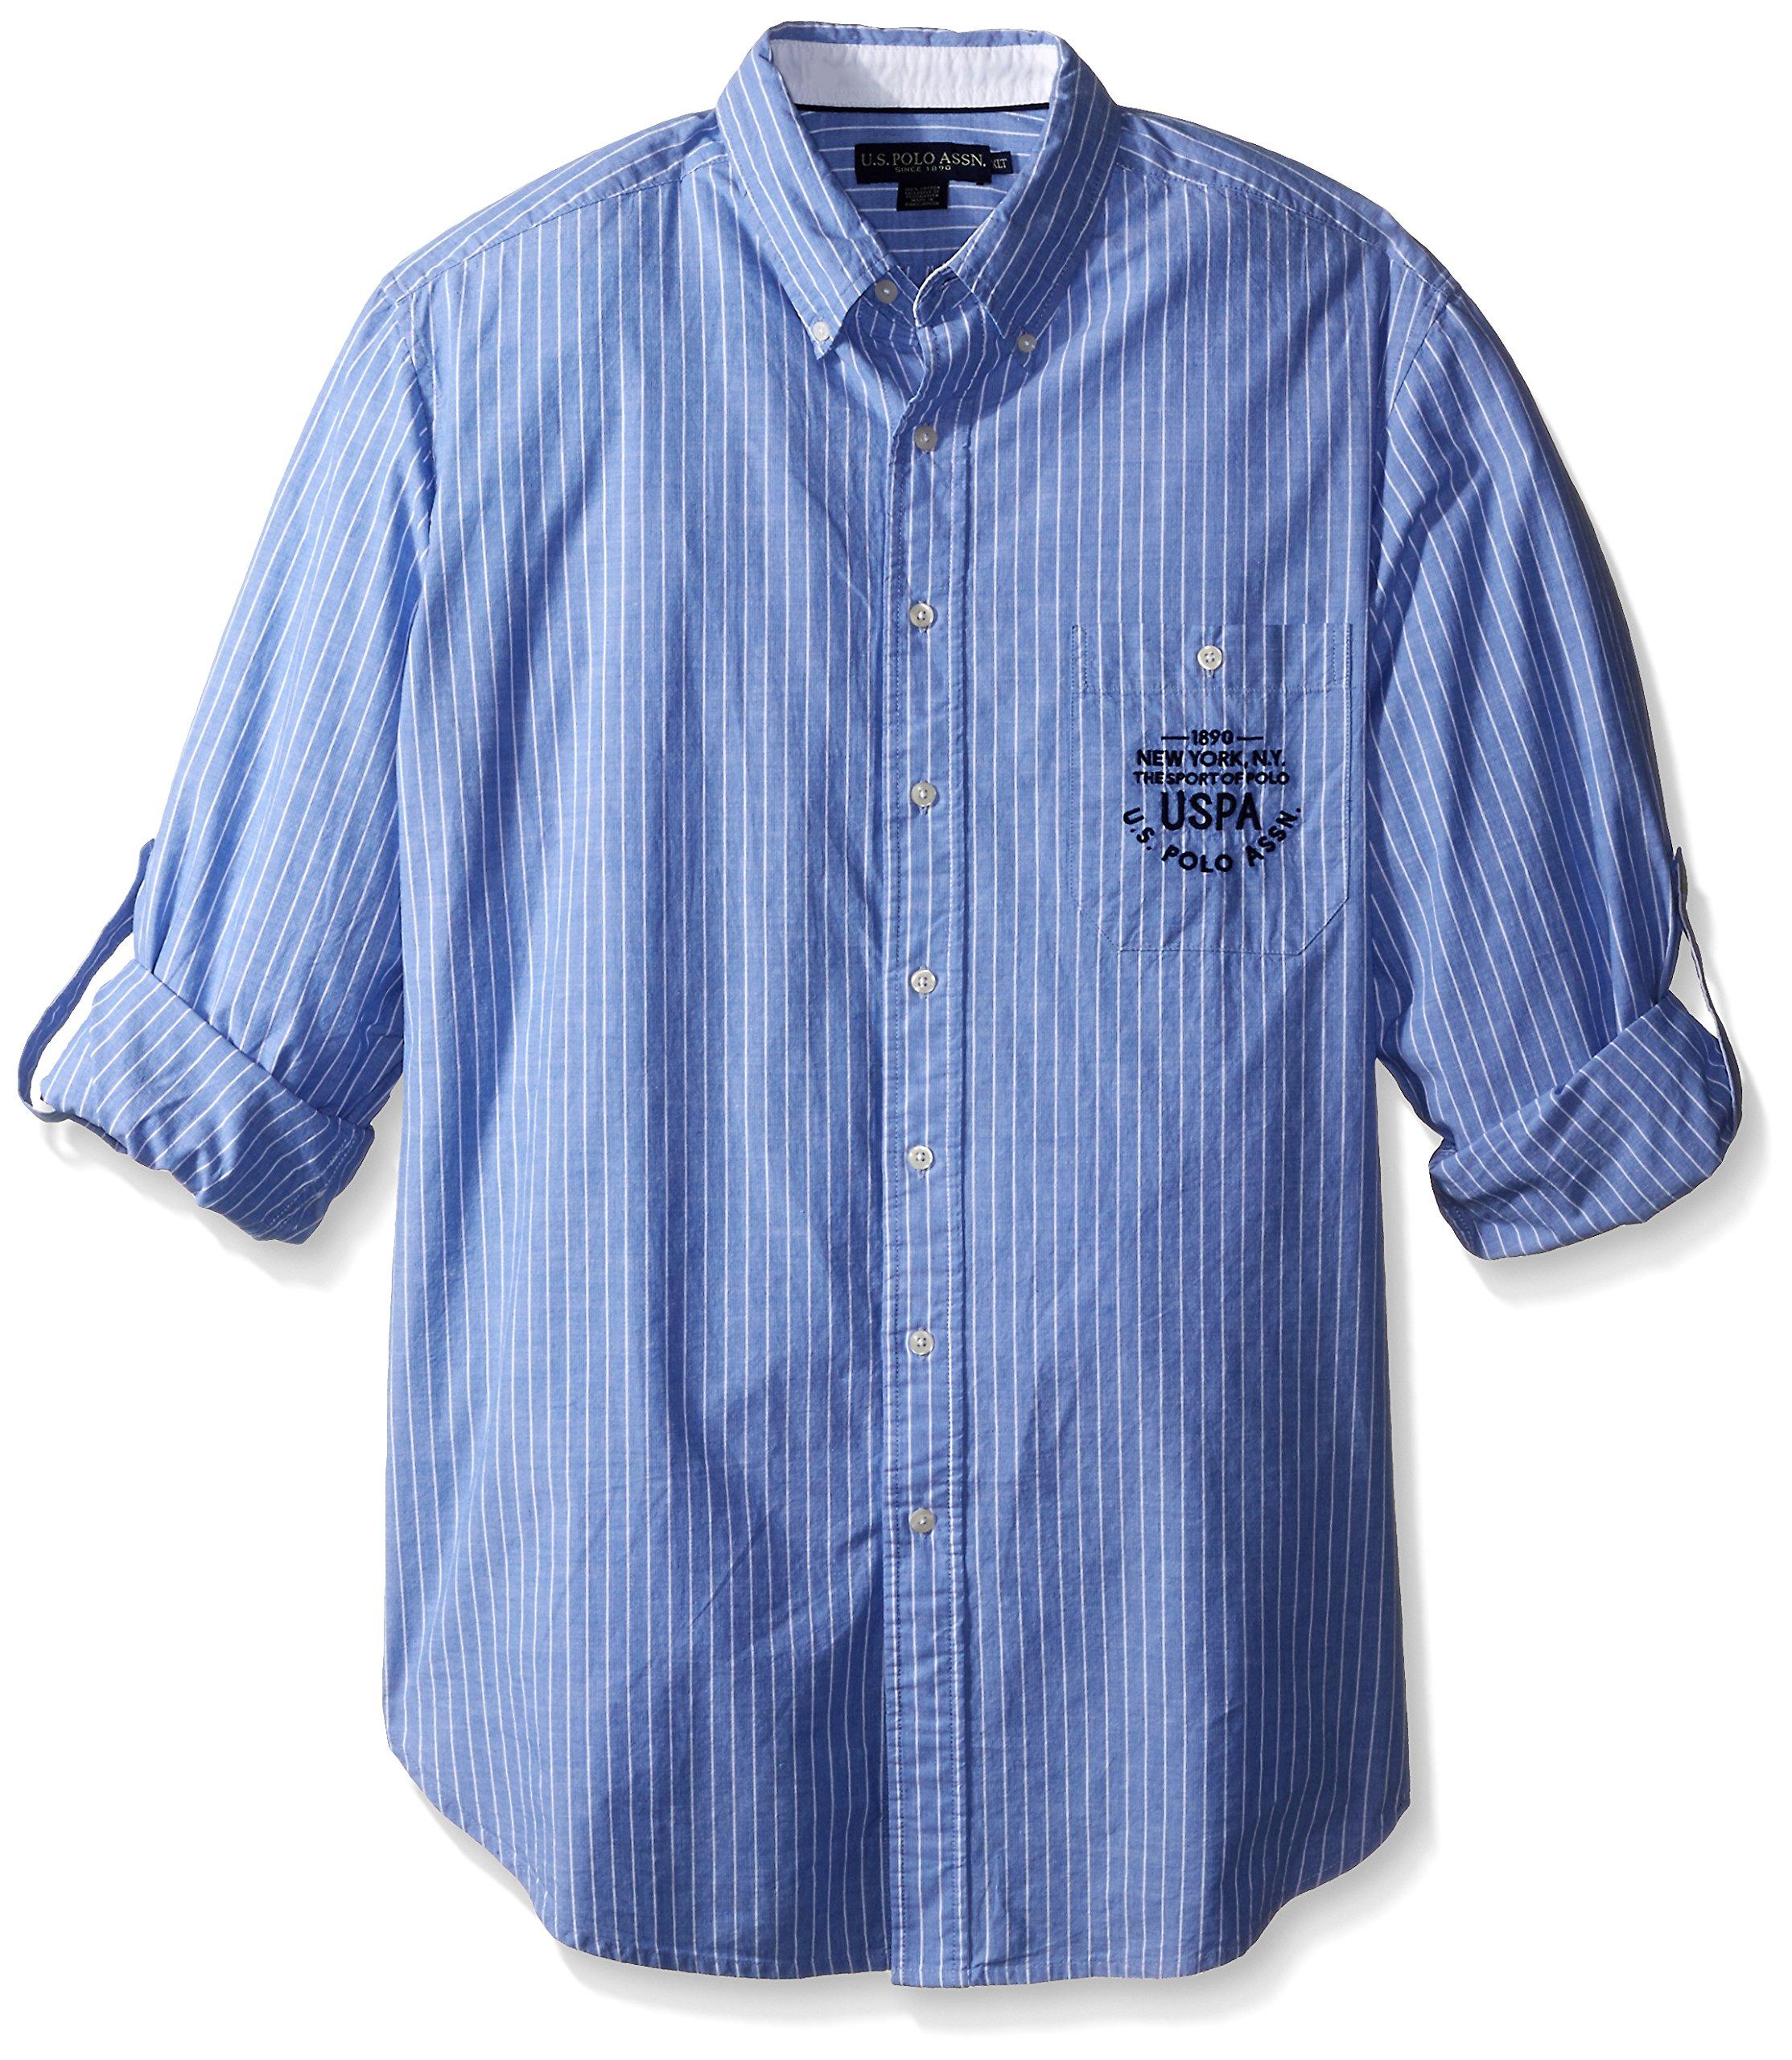 U.S. Polo Assn. Men's Big-Tall Button Down Slim Fit Striped Oxford Shirt, Wedding Blue, 3X